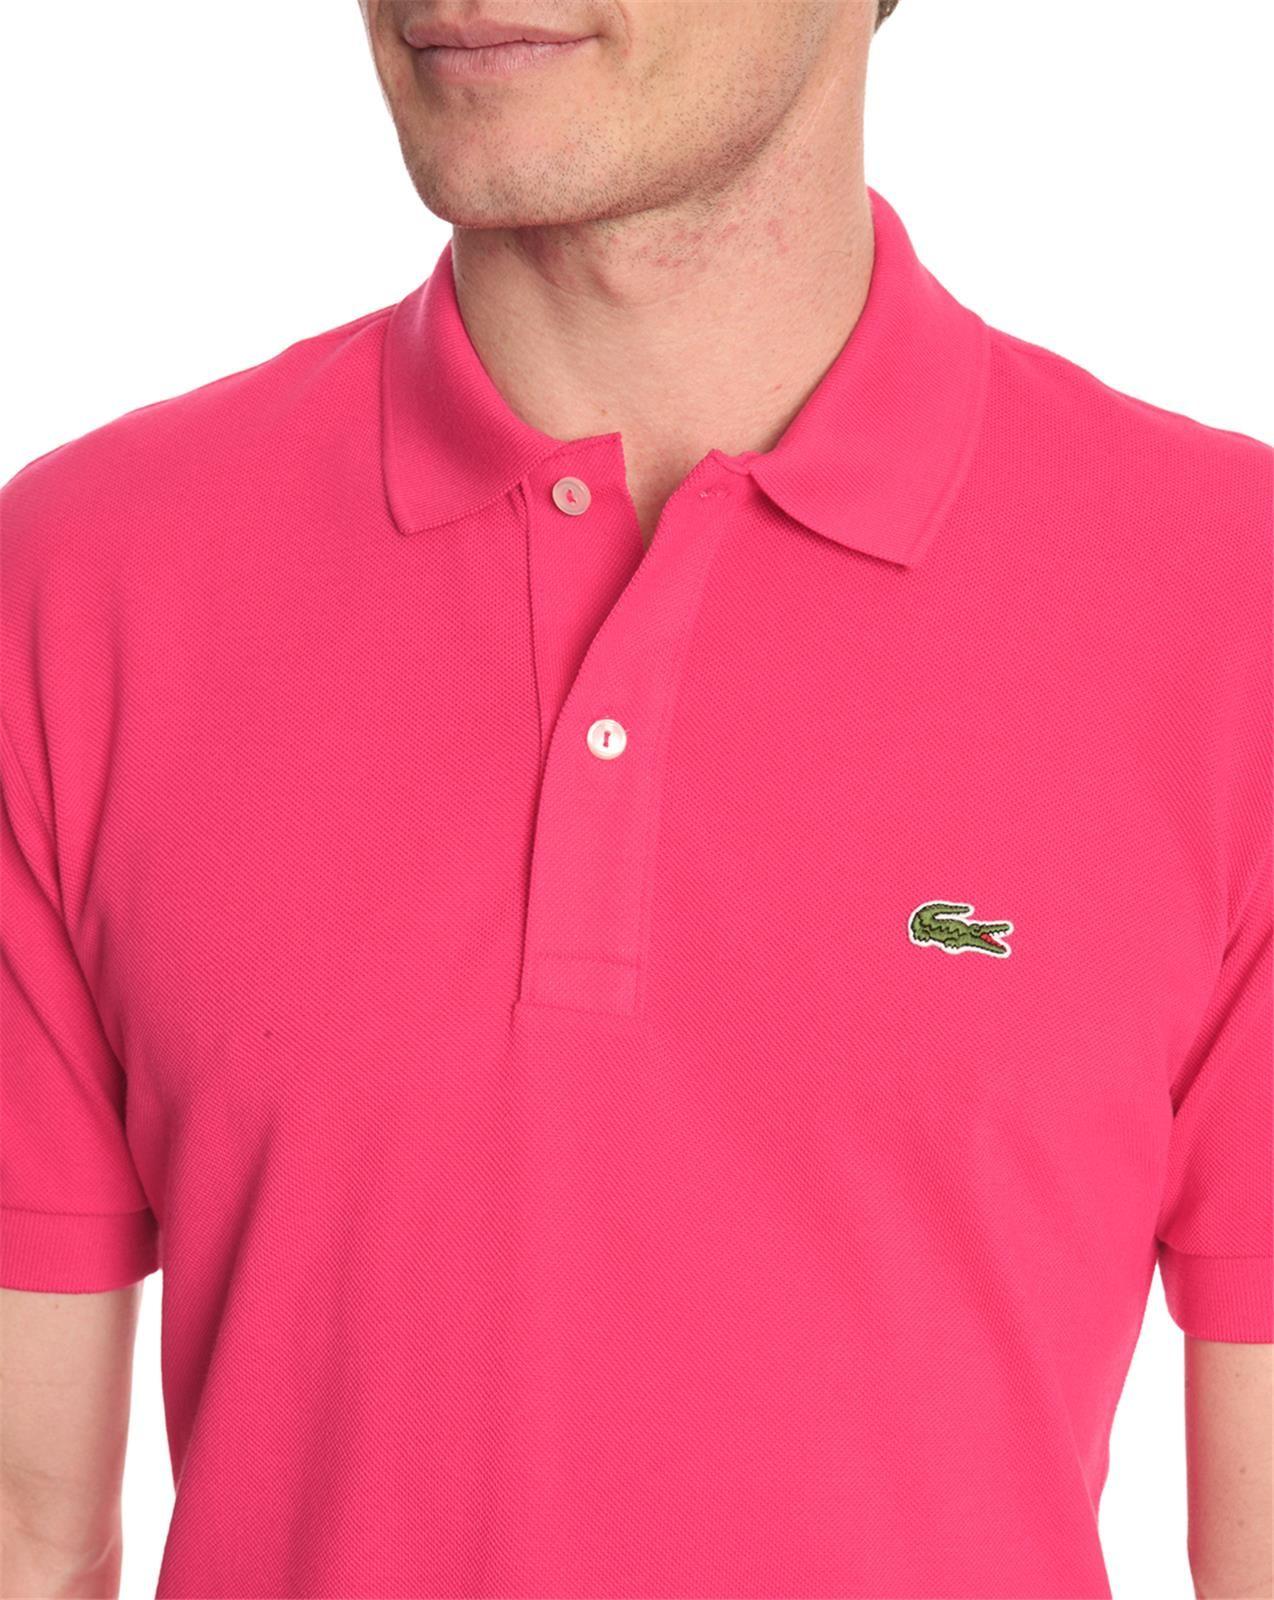 lacoste slim fit shortsleeved pink polo shirt in pink for men lyst. Black Bedroom Furniture Sets. Home Design Ideas